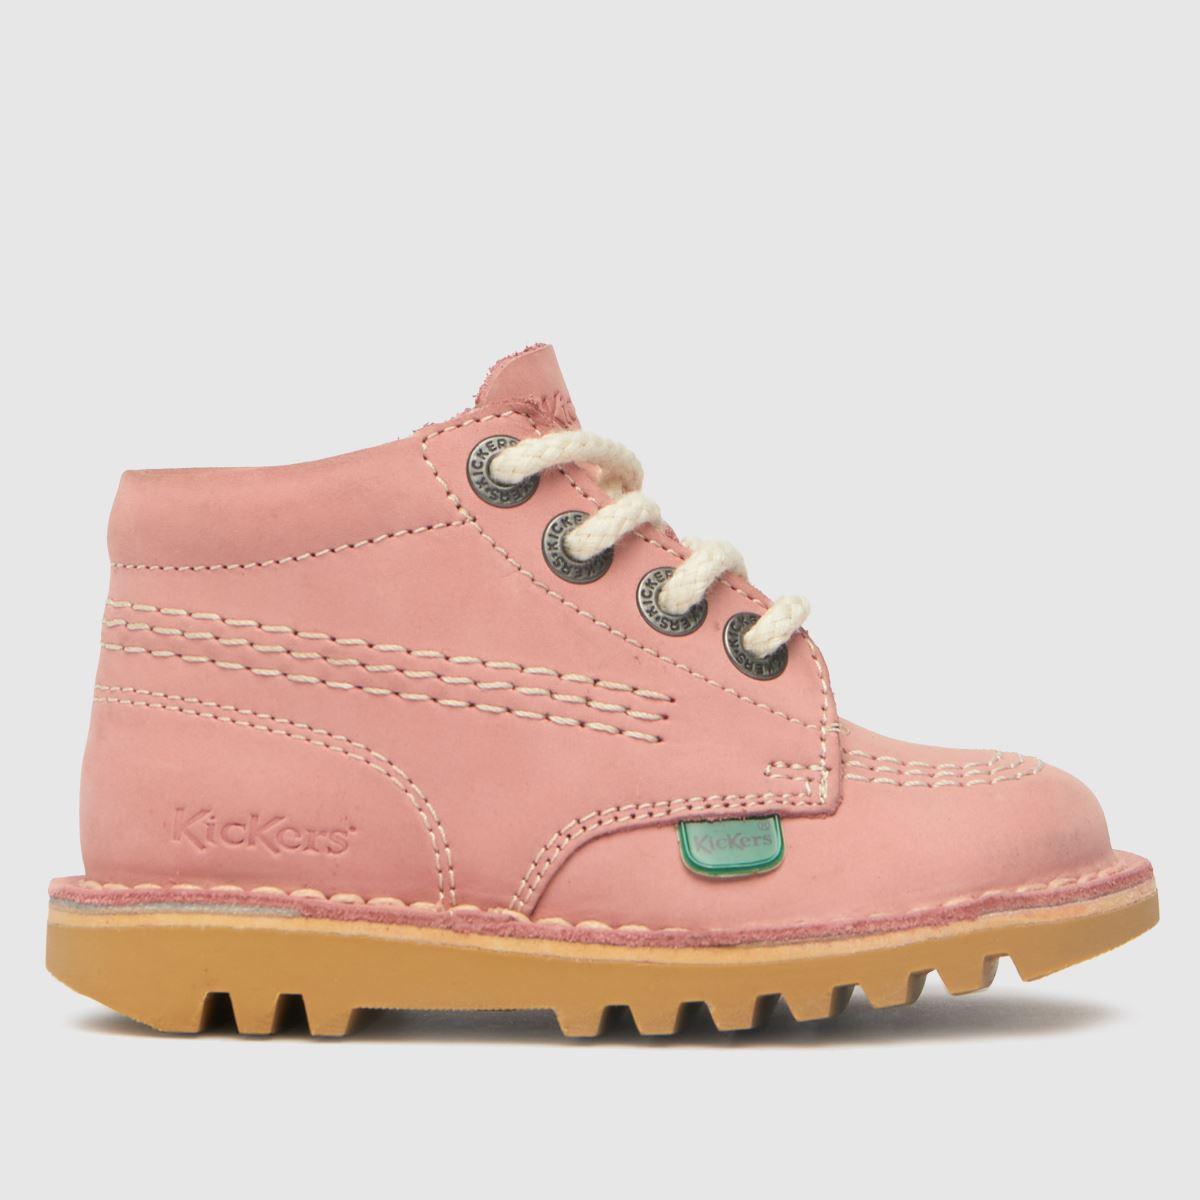 Kickers Pale Pink Hi Zip Boots Toddler